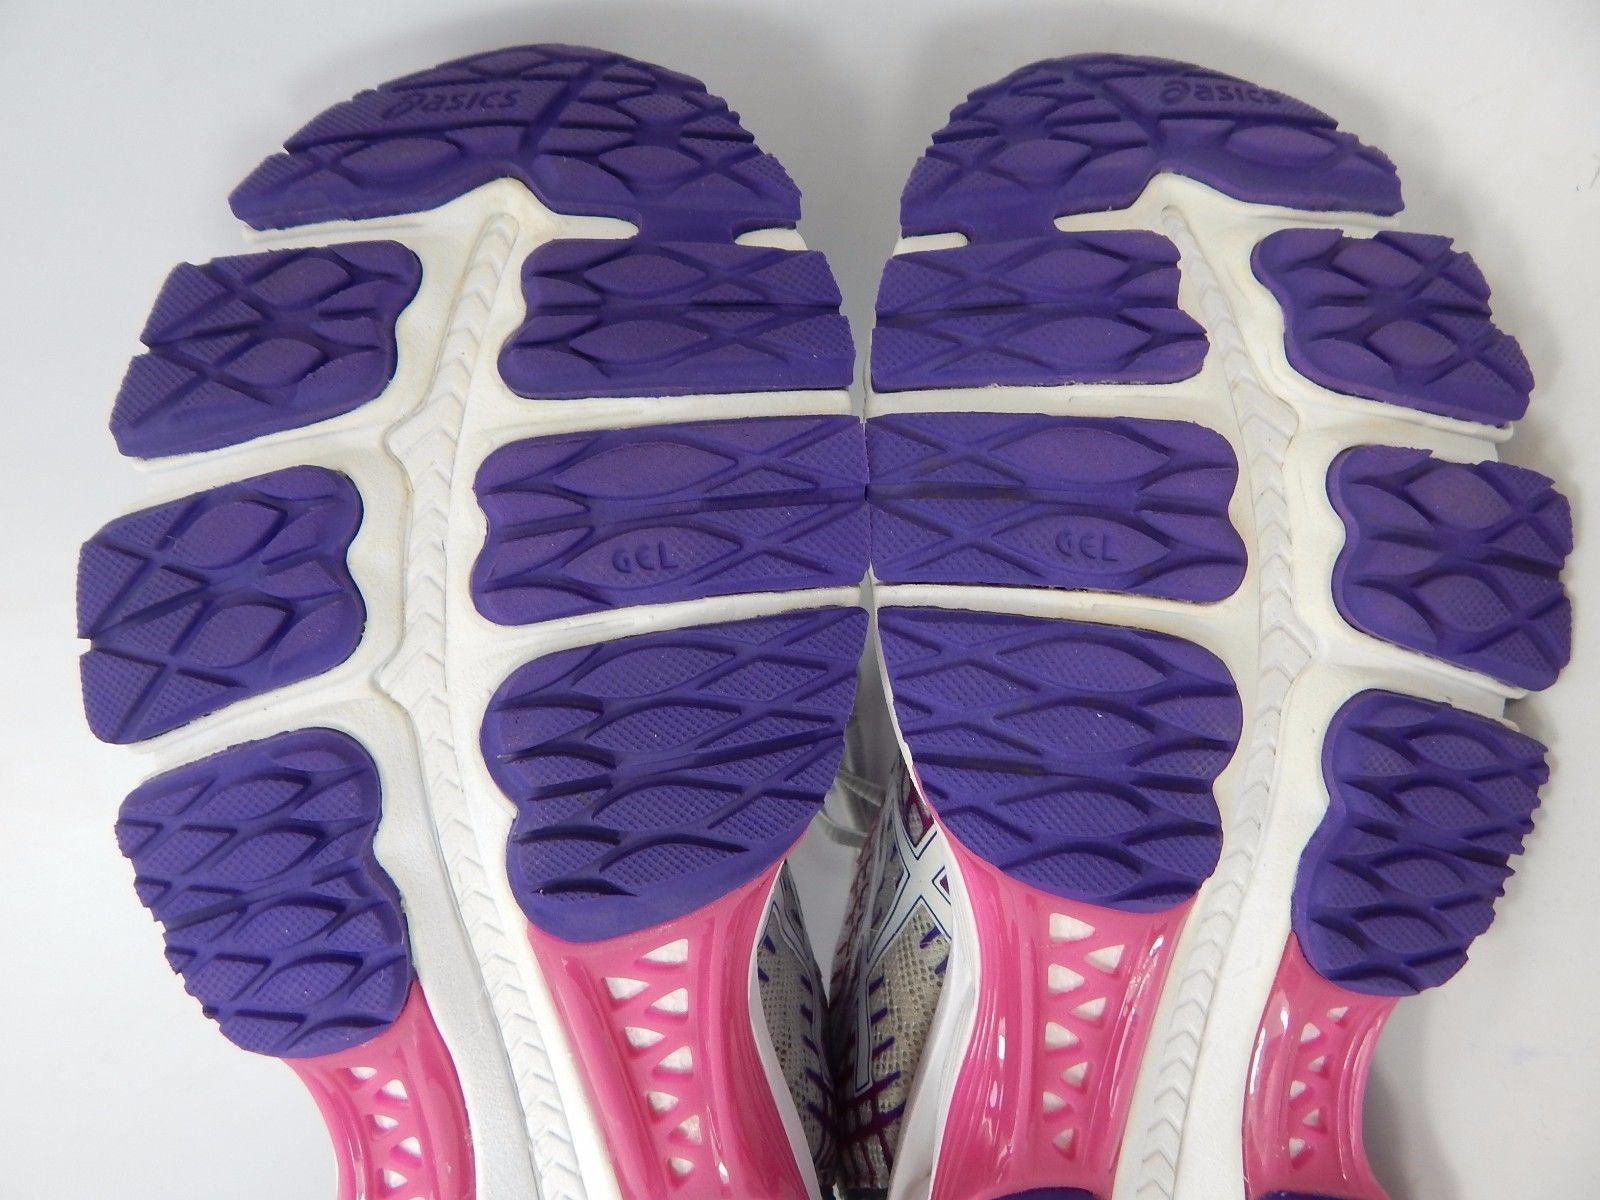 Nike Air Women's Athletic Shoes Size US 9 M (B) EU 40.5 White 950911